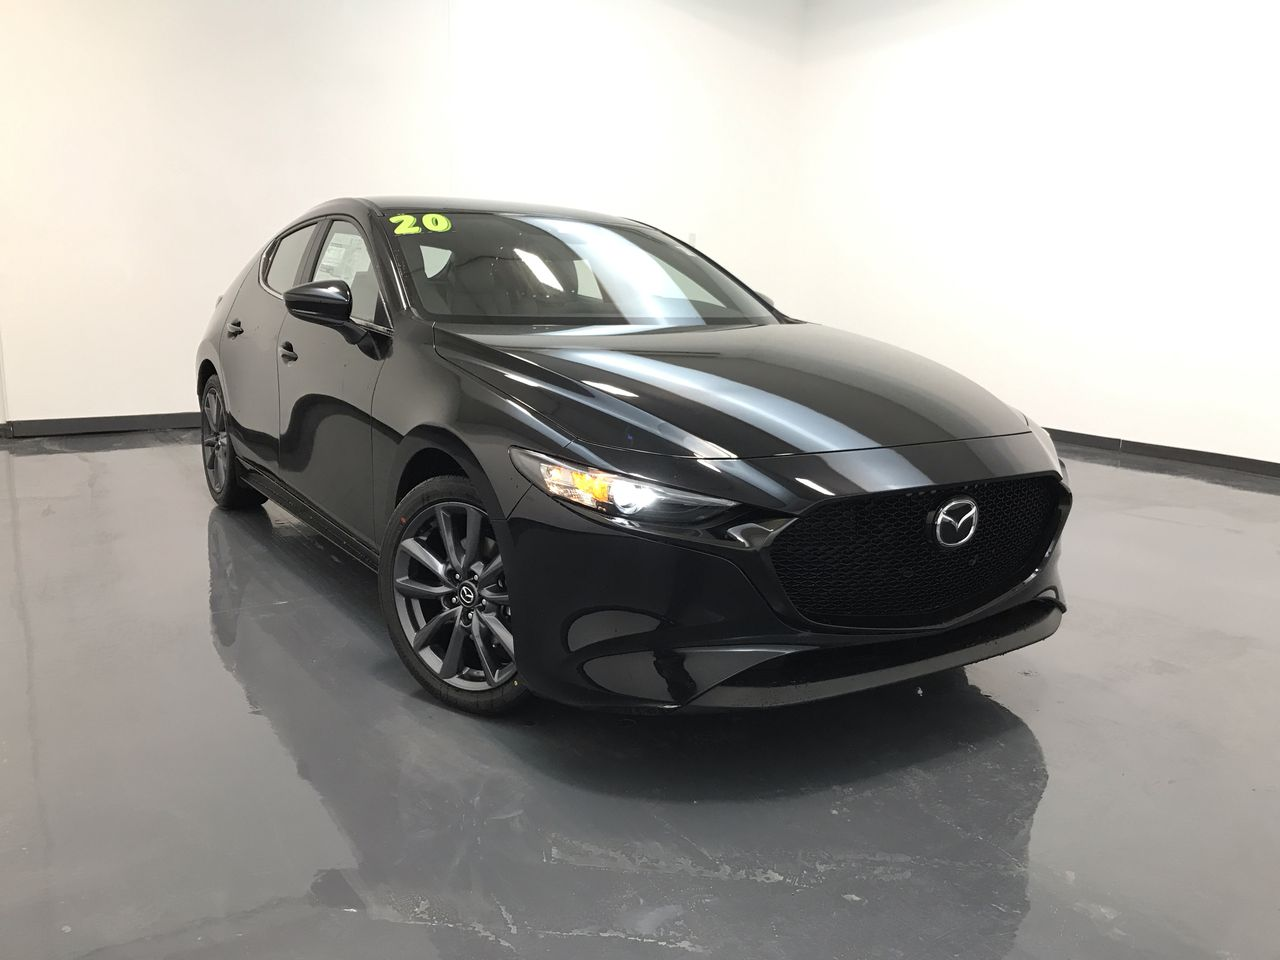 2020 Mazda Mazda3 Hatchback Hatchback AWD  - MA3348  - C & S Car Company